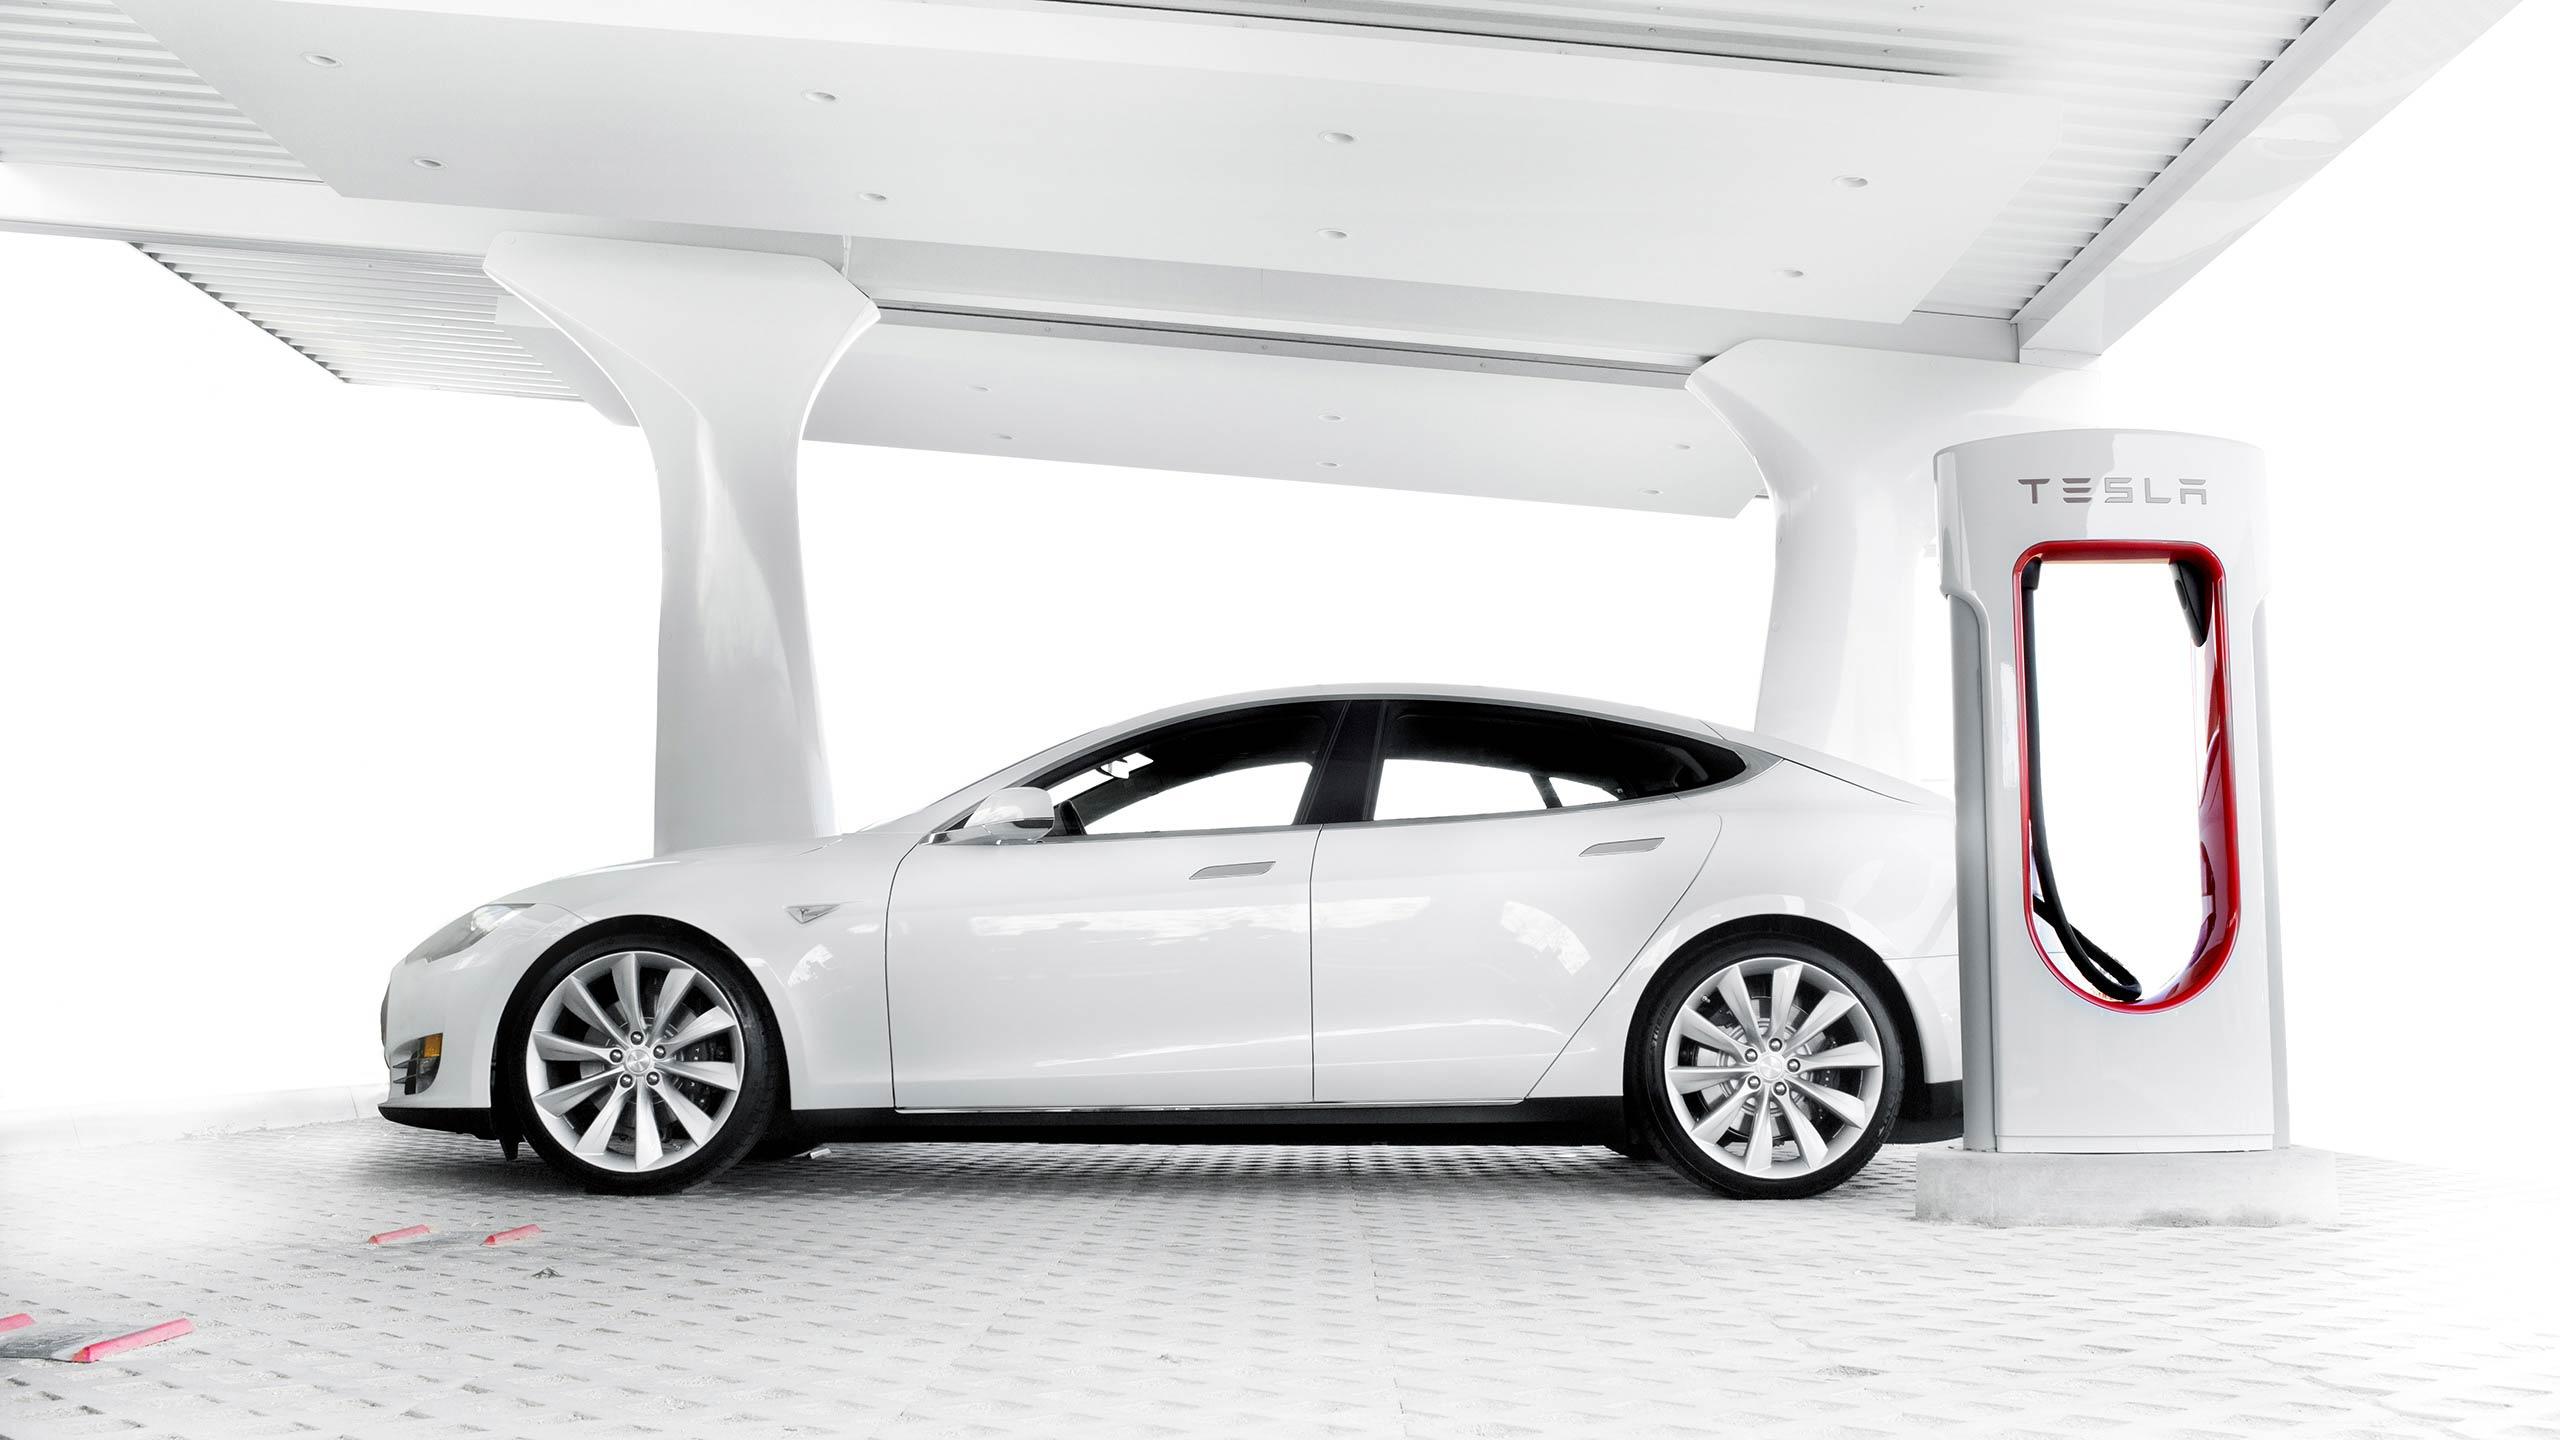 Tesla Image: Todd Bianco's ACarIsNotARefrigerator.com Blog